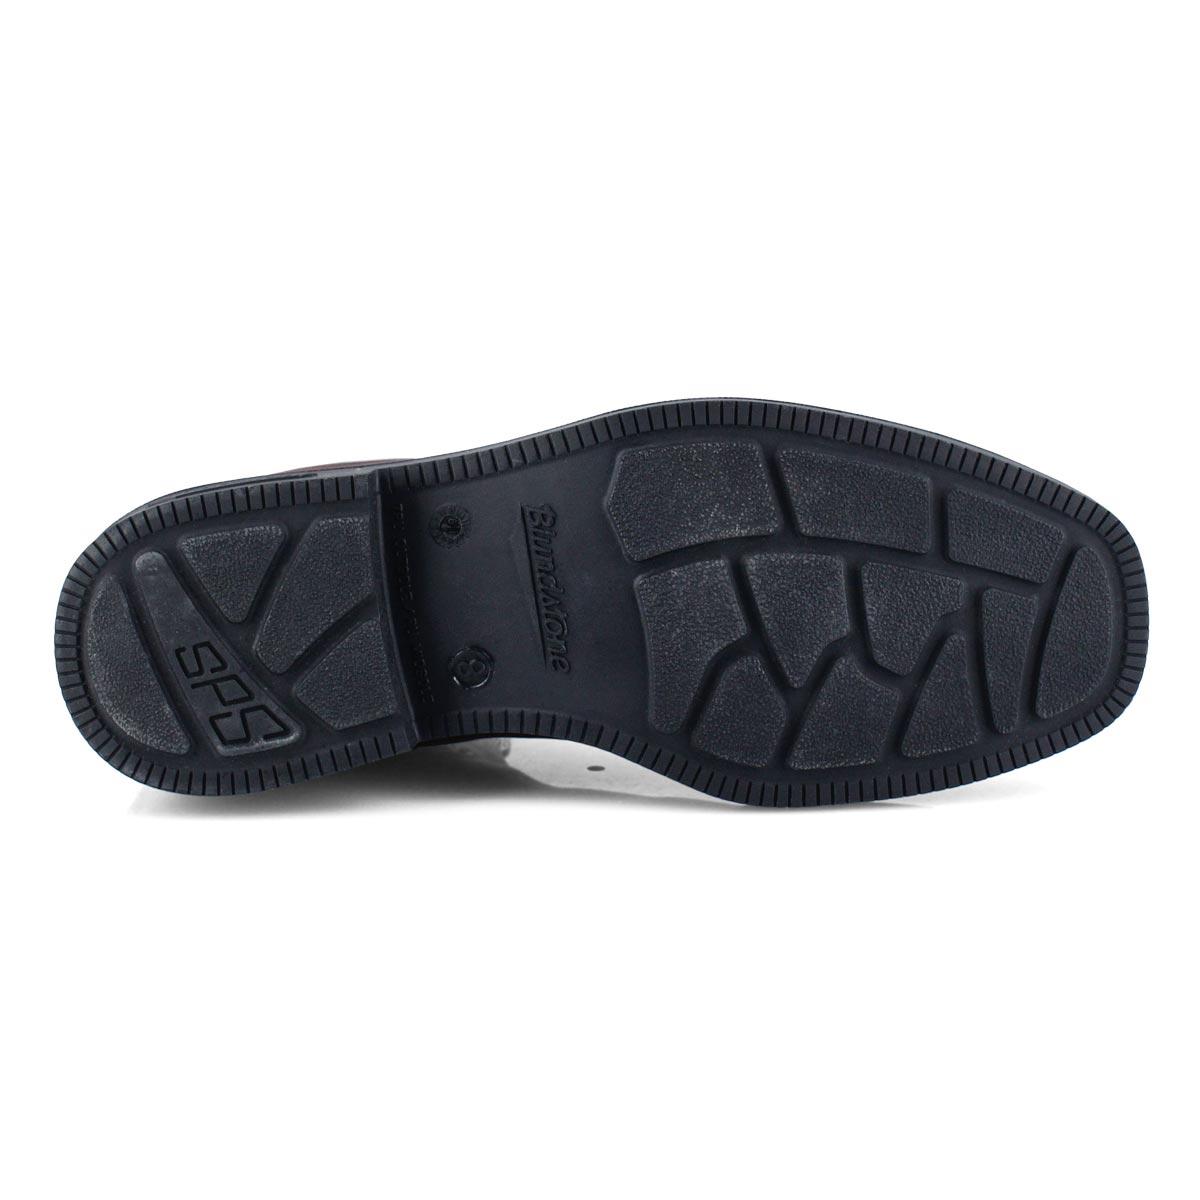 Unisex Chisel Toe redwood twn gore boot